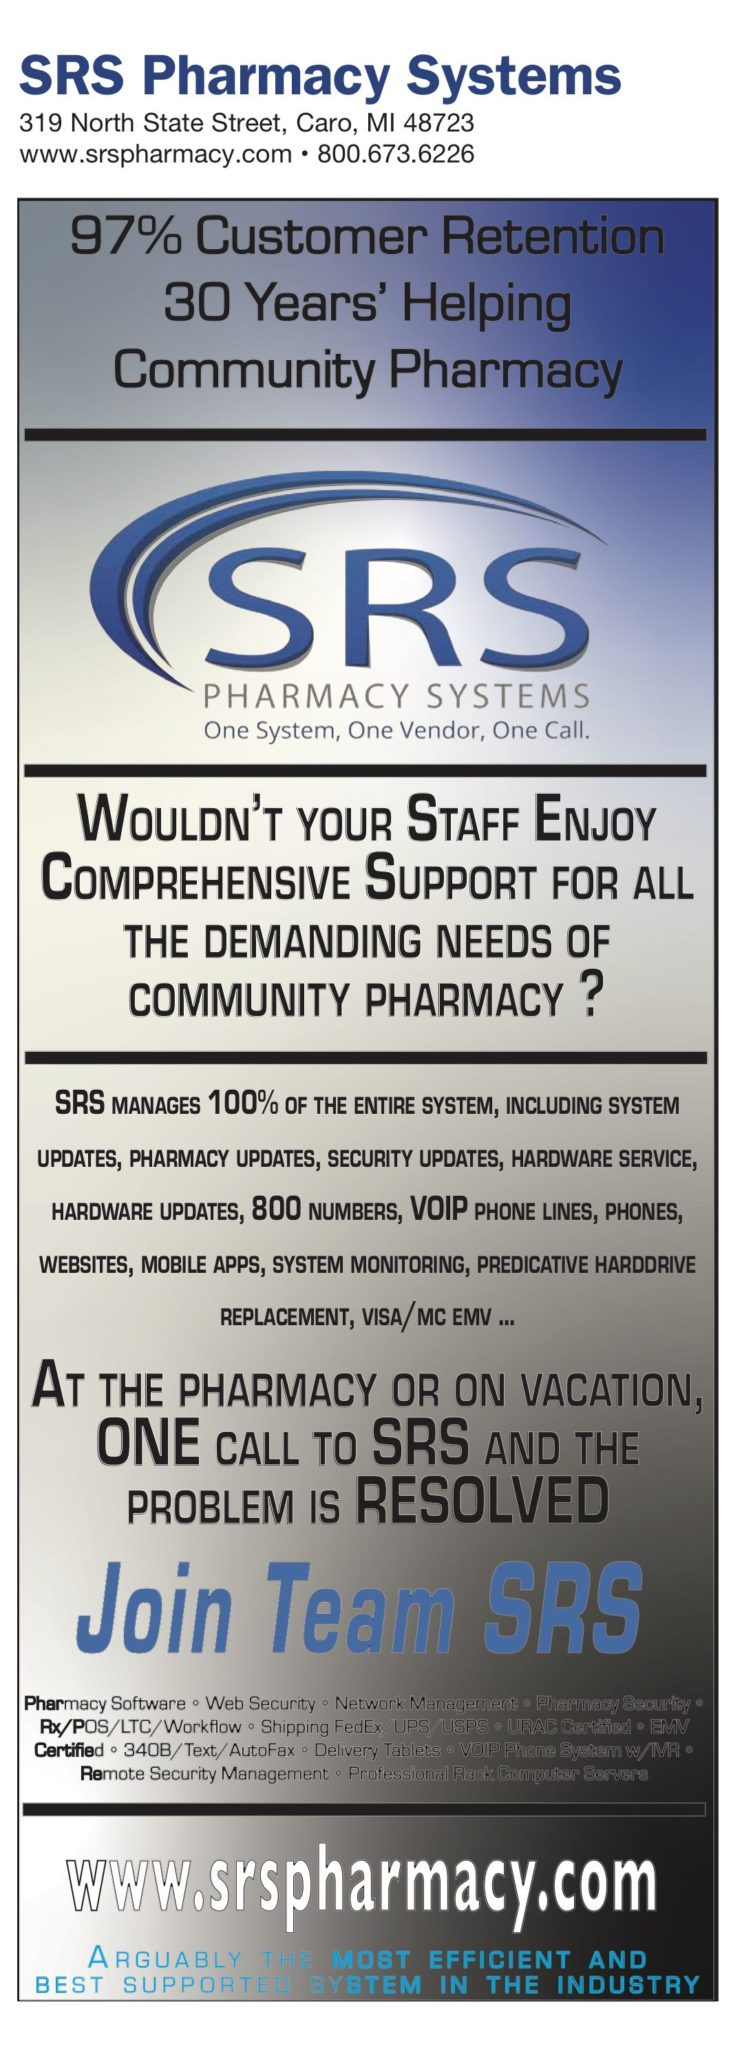 ComputerTalk_2019_Pharmacy_Buyers_Guide_38_SRS_Pharmacy_Software